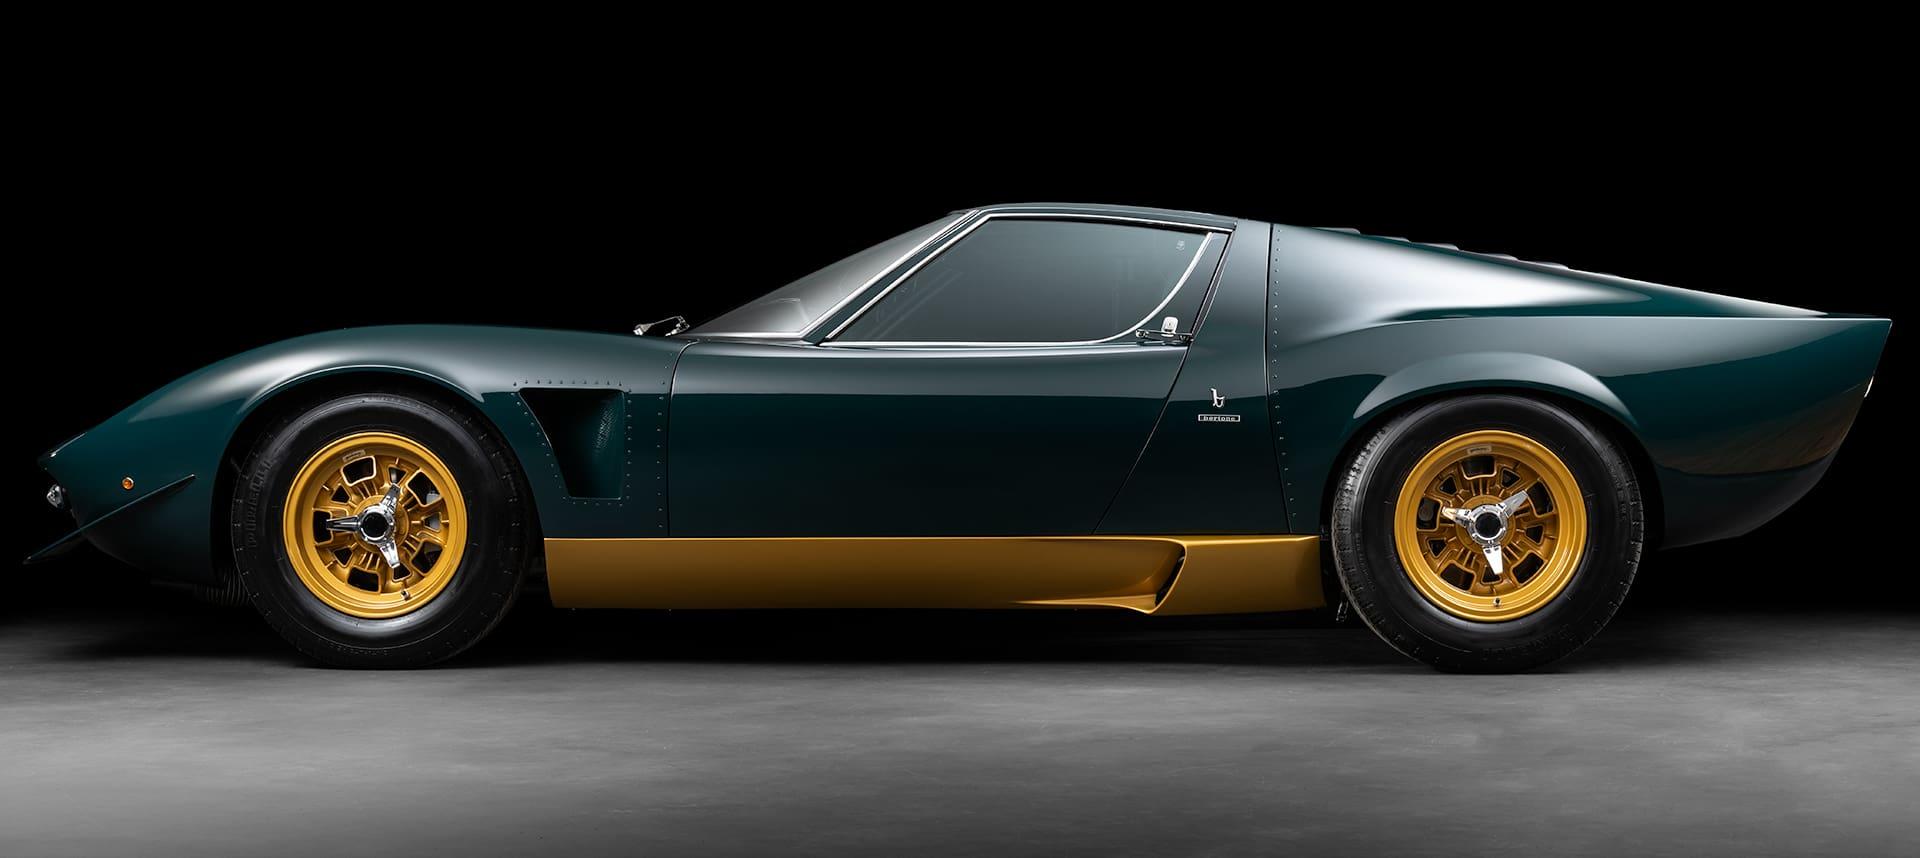 Miami's Art Basel Features a '68 Lamborghini Miura